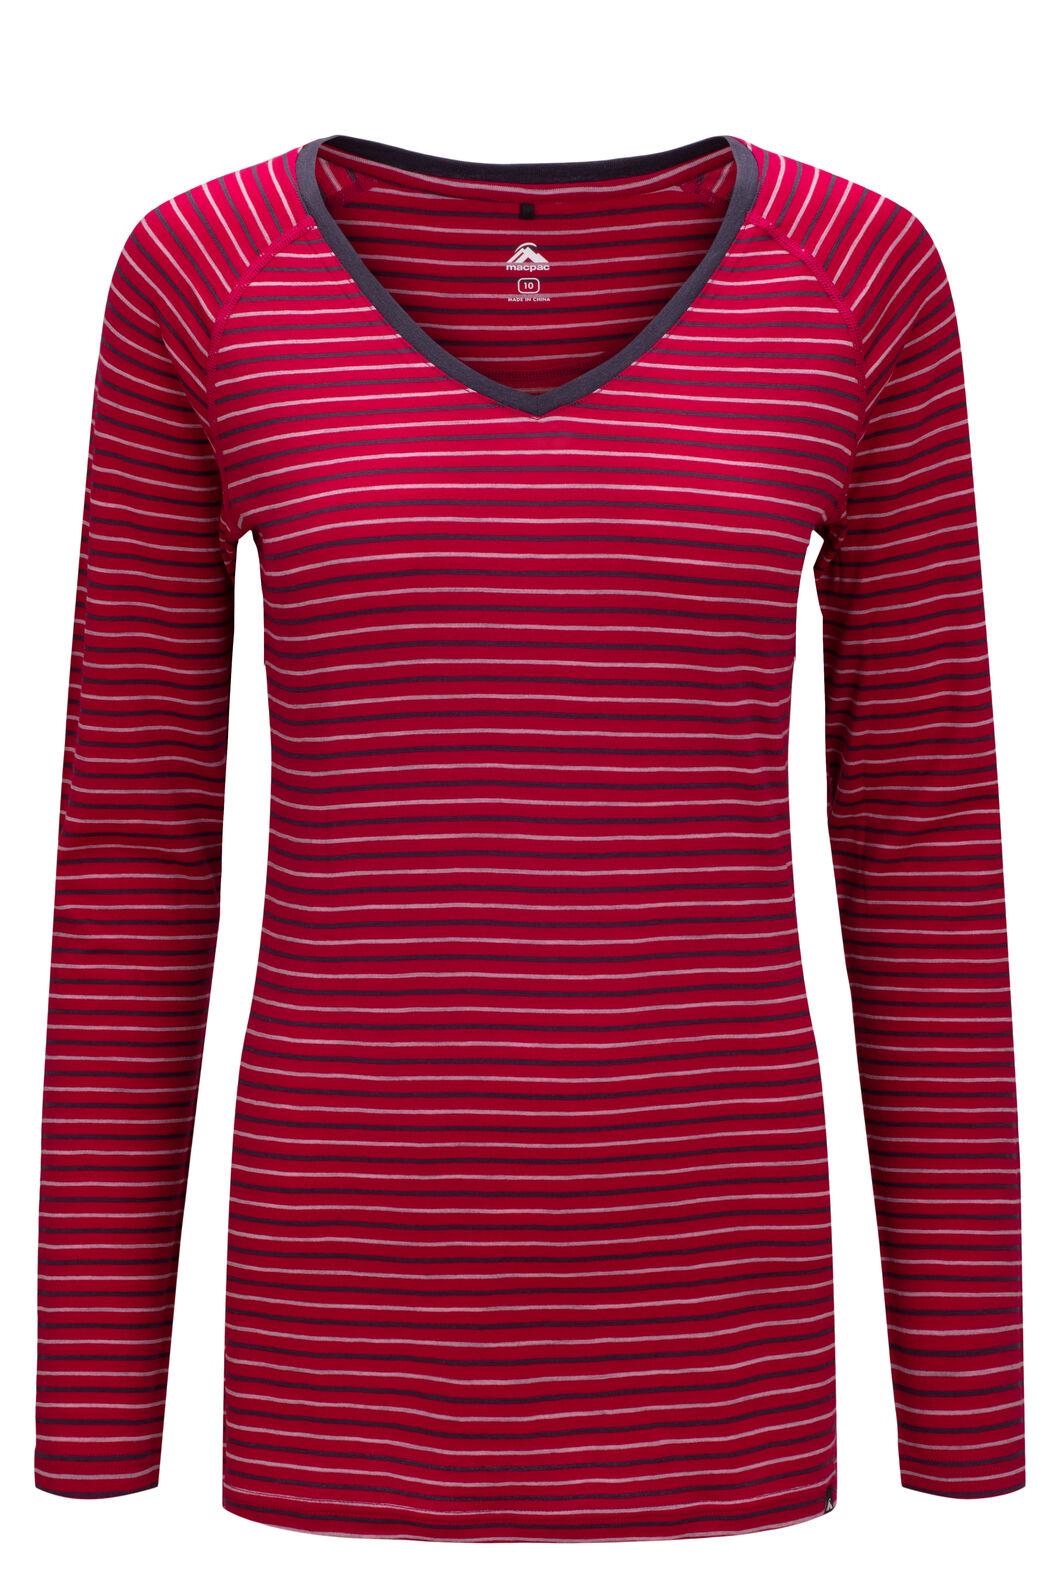 Macpac Women's 150 Merino V-Neck Top, Persian Red Stripe, hi-res